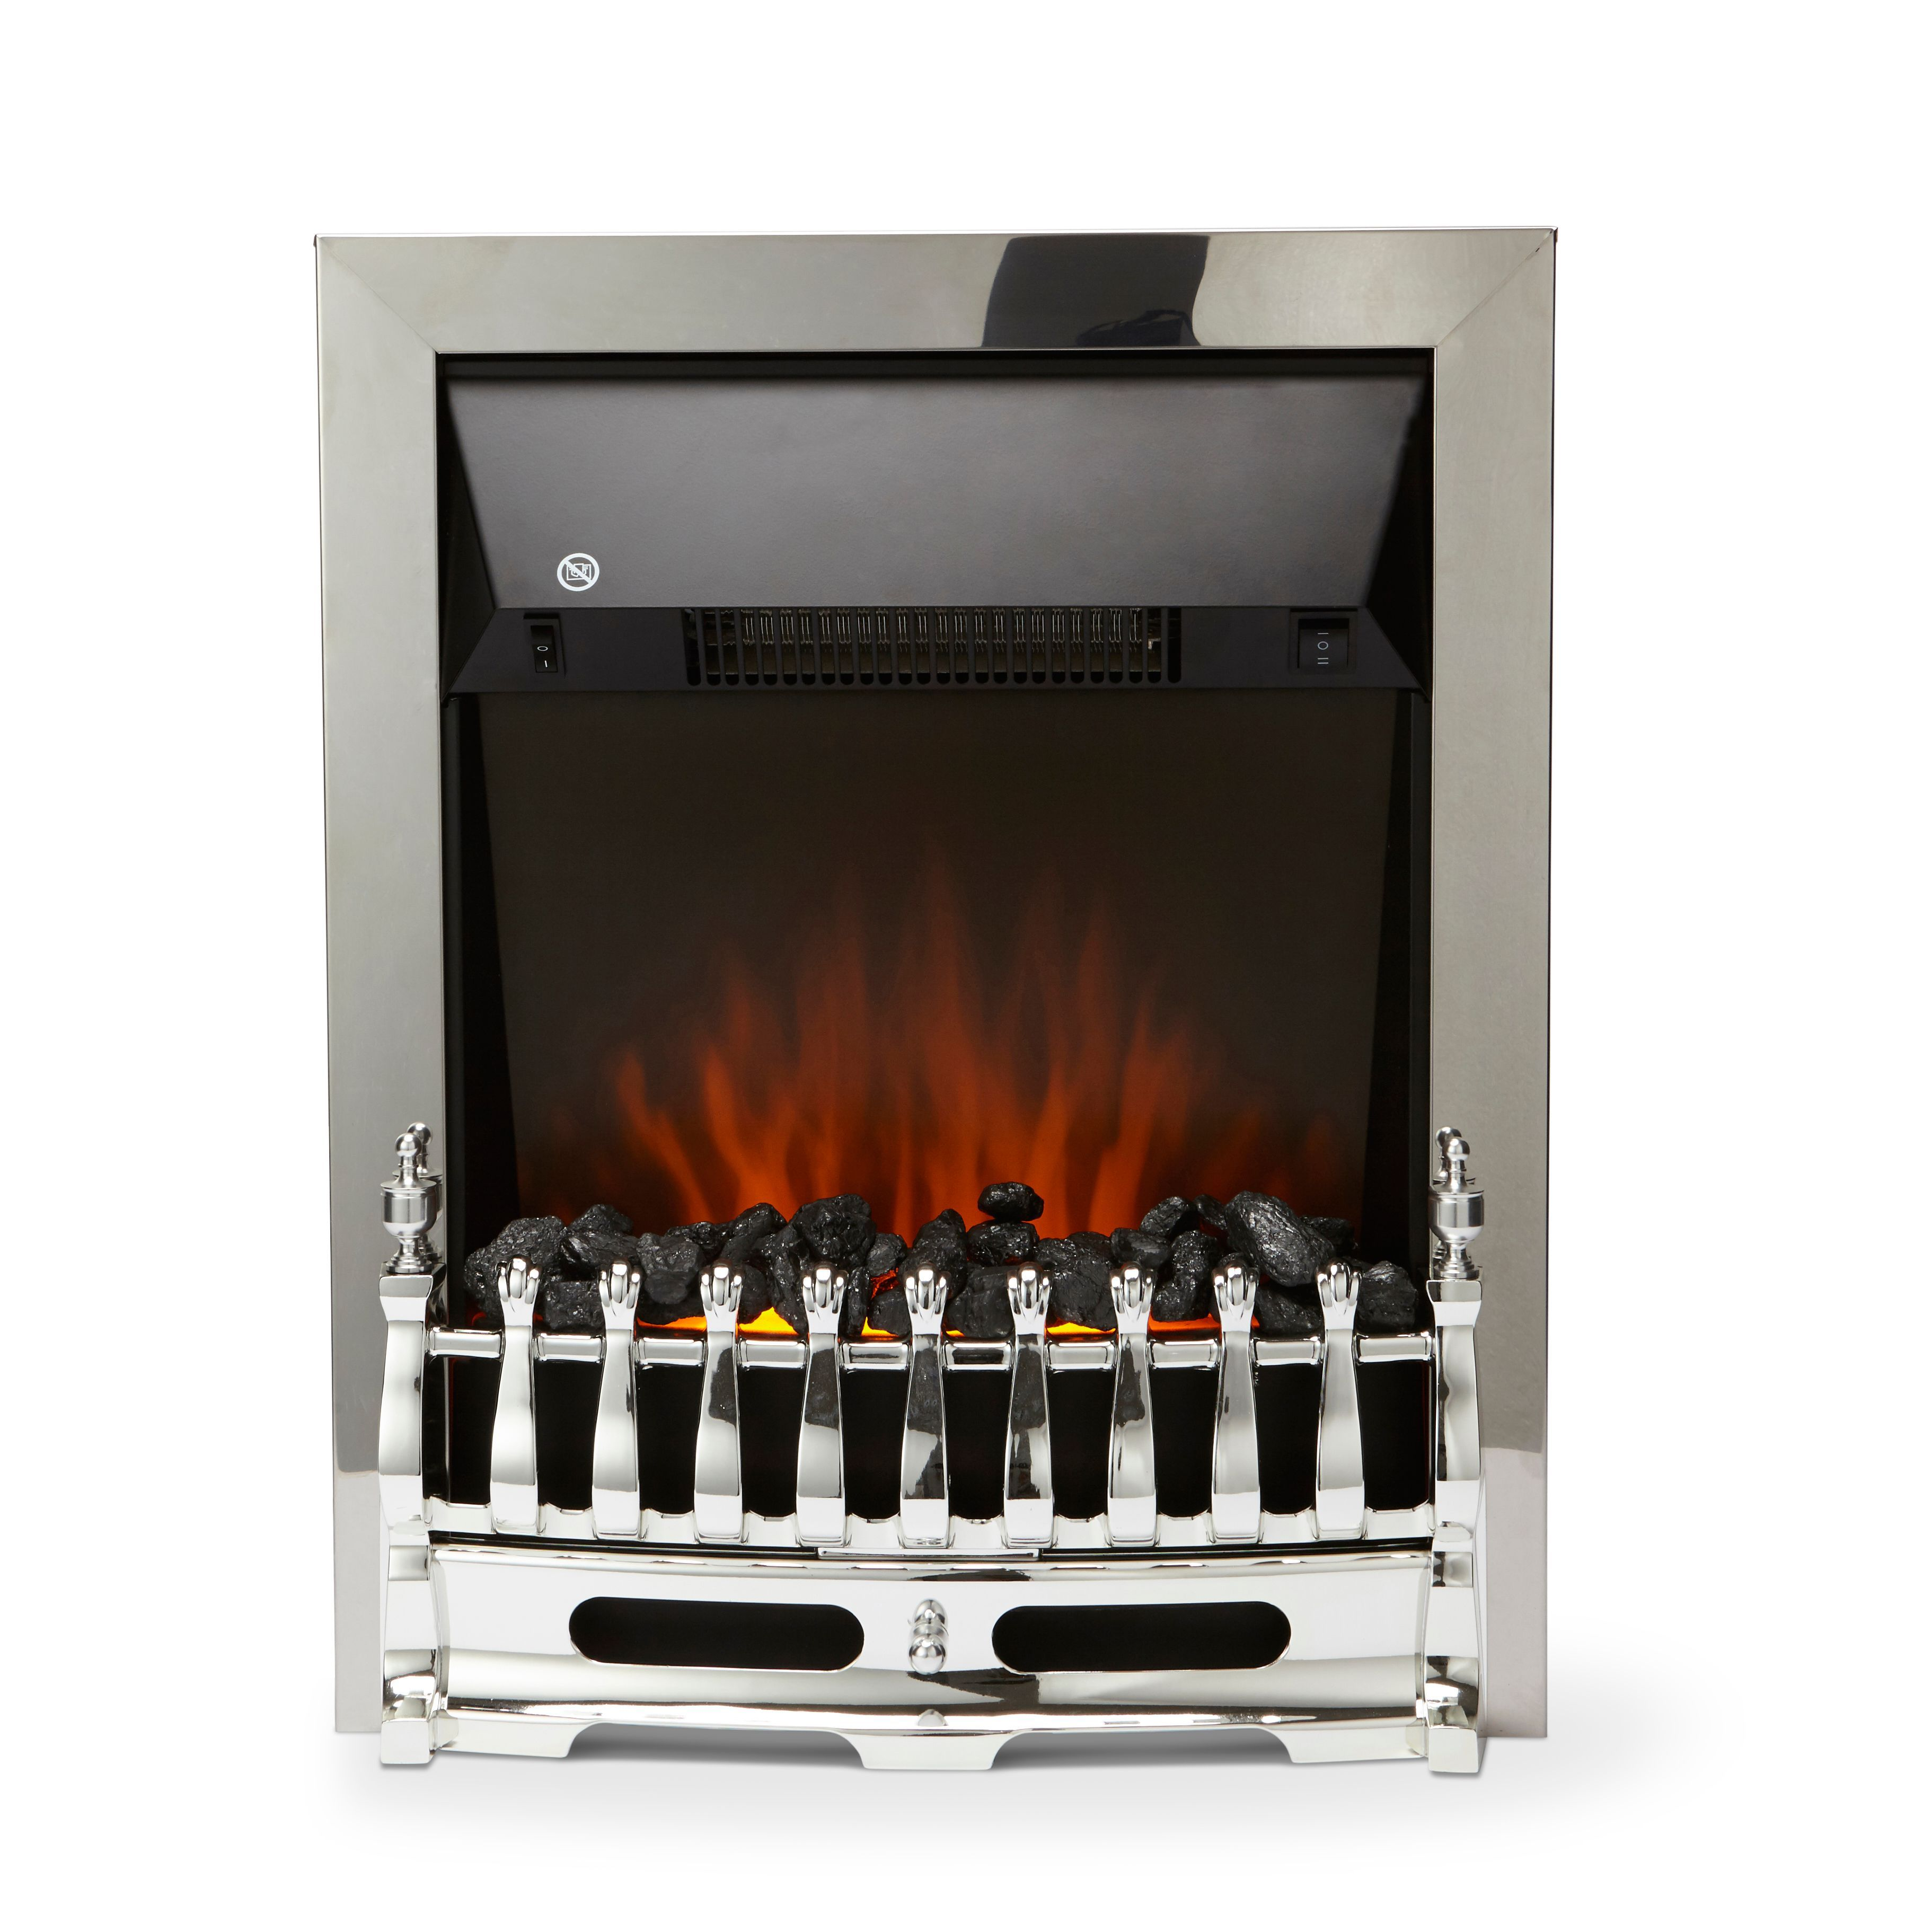 led insert electric fireplace departments diy at b q. Black Bedroom Furniture Sets. Home Design Ideas